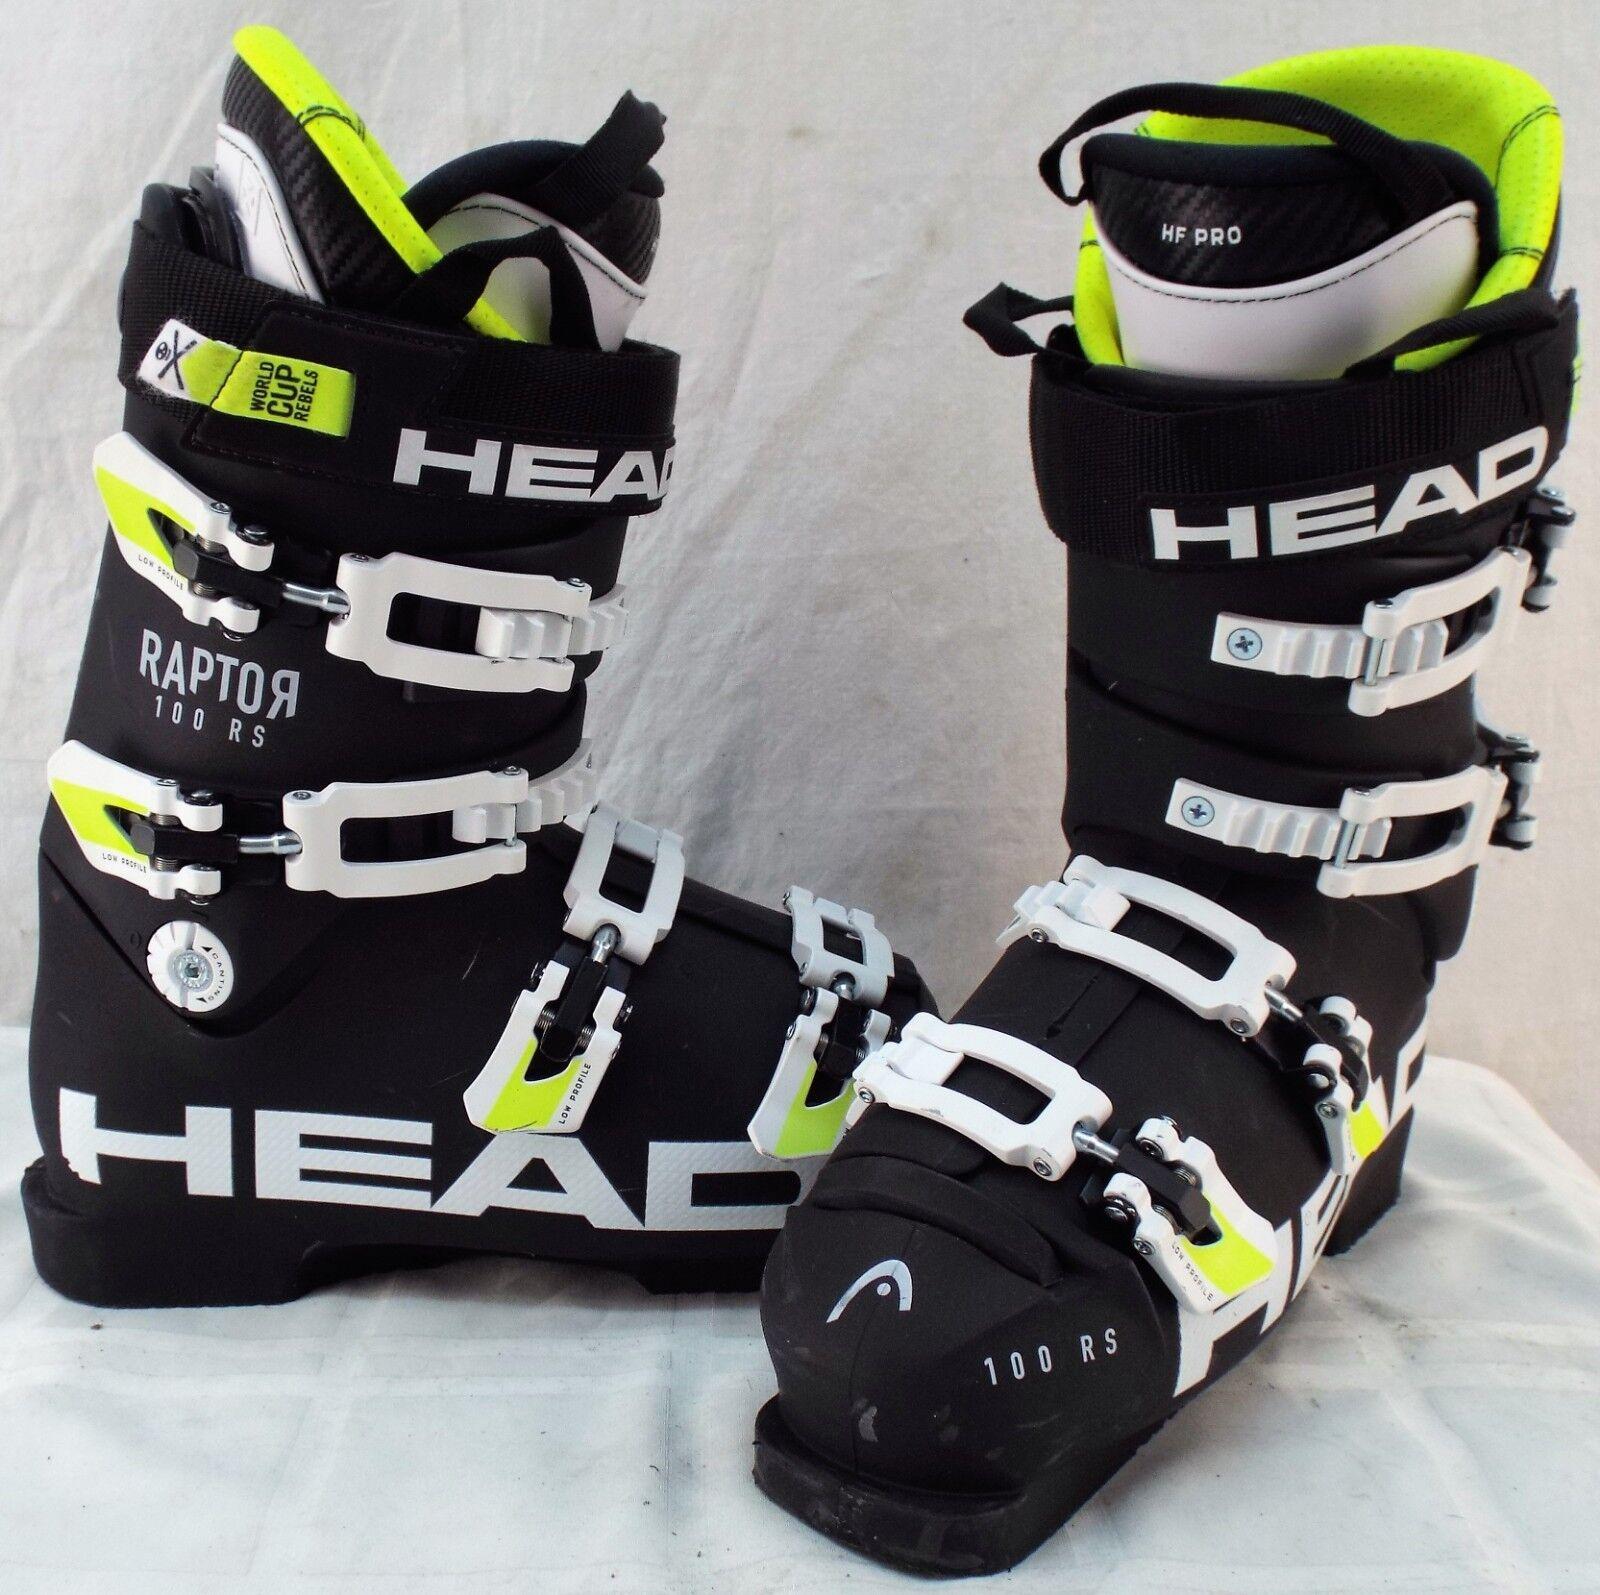 Head Raptor 100 RS WCR Used Men's Ski Boots  Size 26.5  best offer